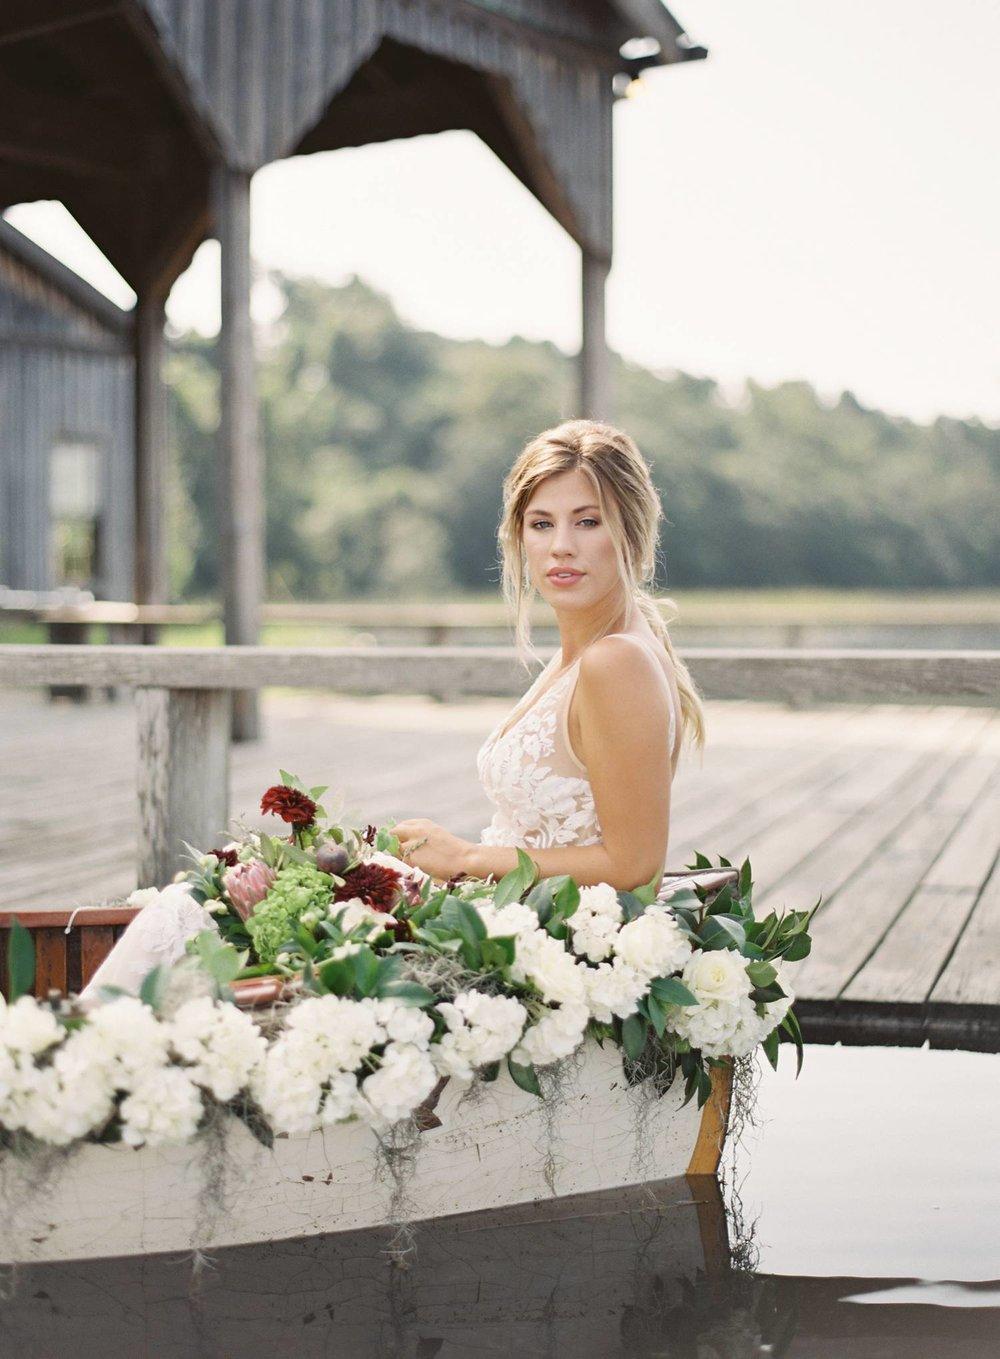 boonehallplantation_wedding_24.jpg